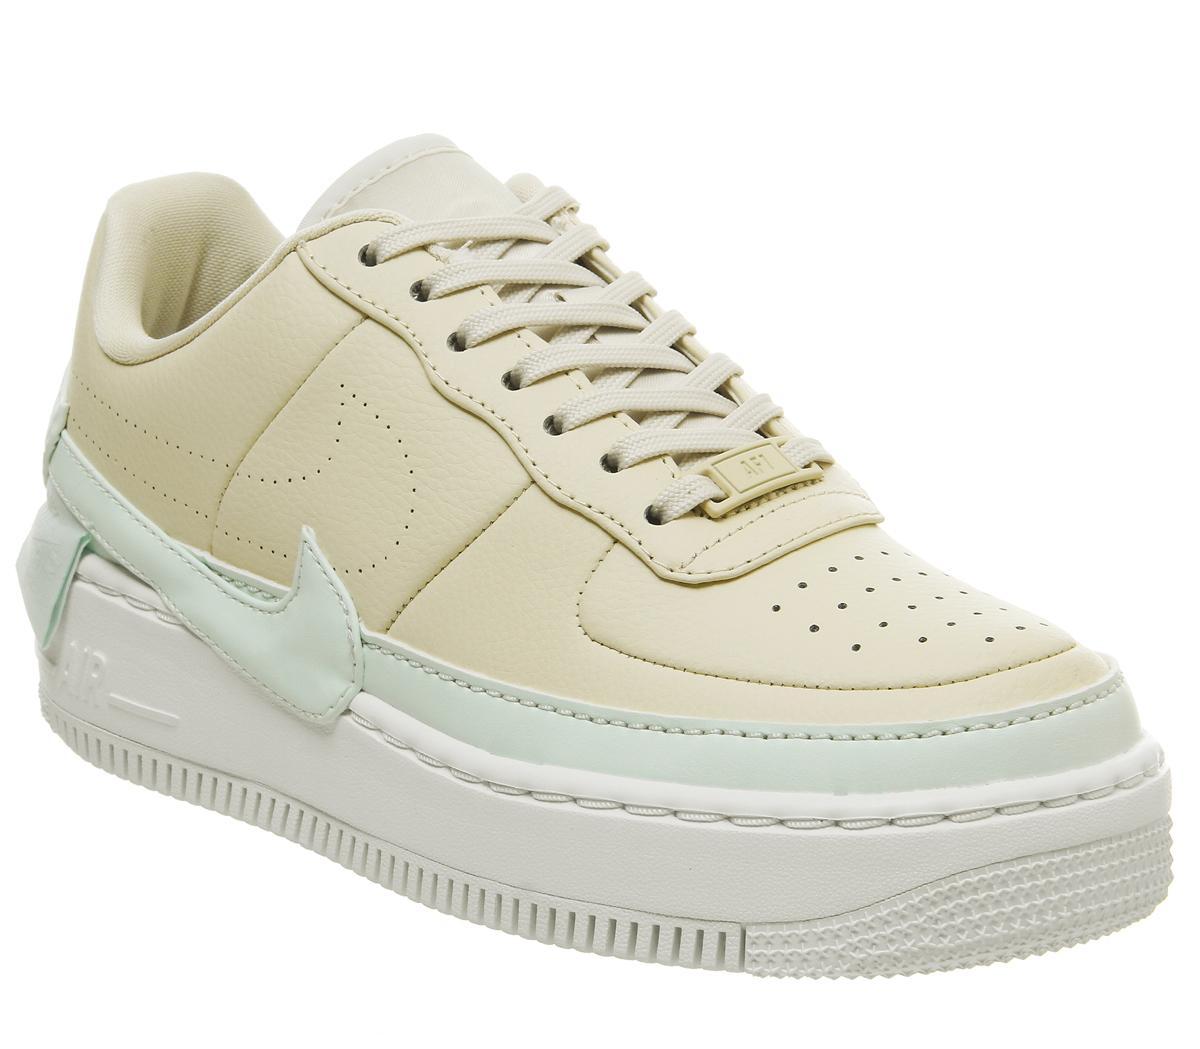 Nike Air Force 1 Jester Light Cream